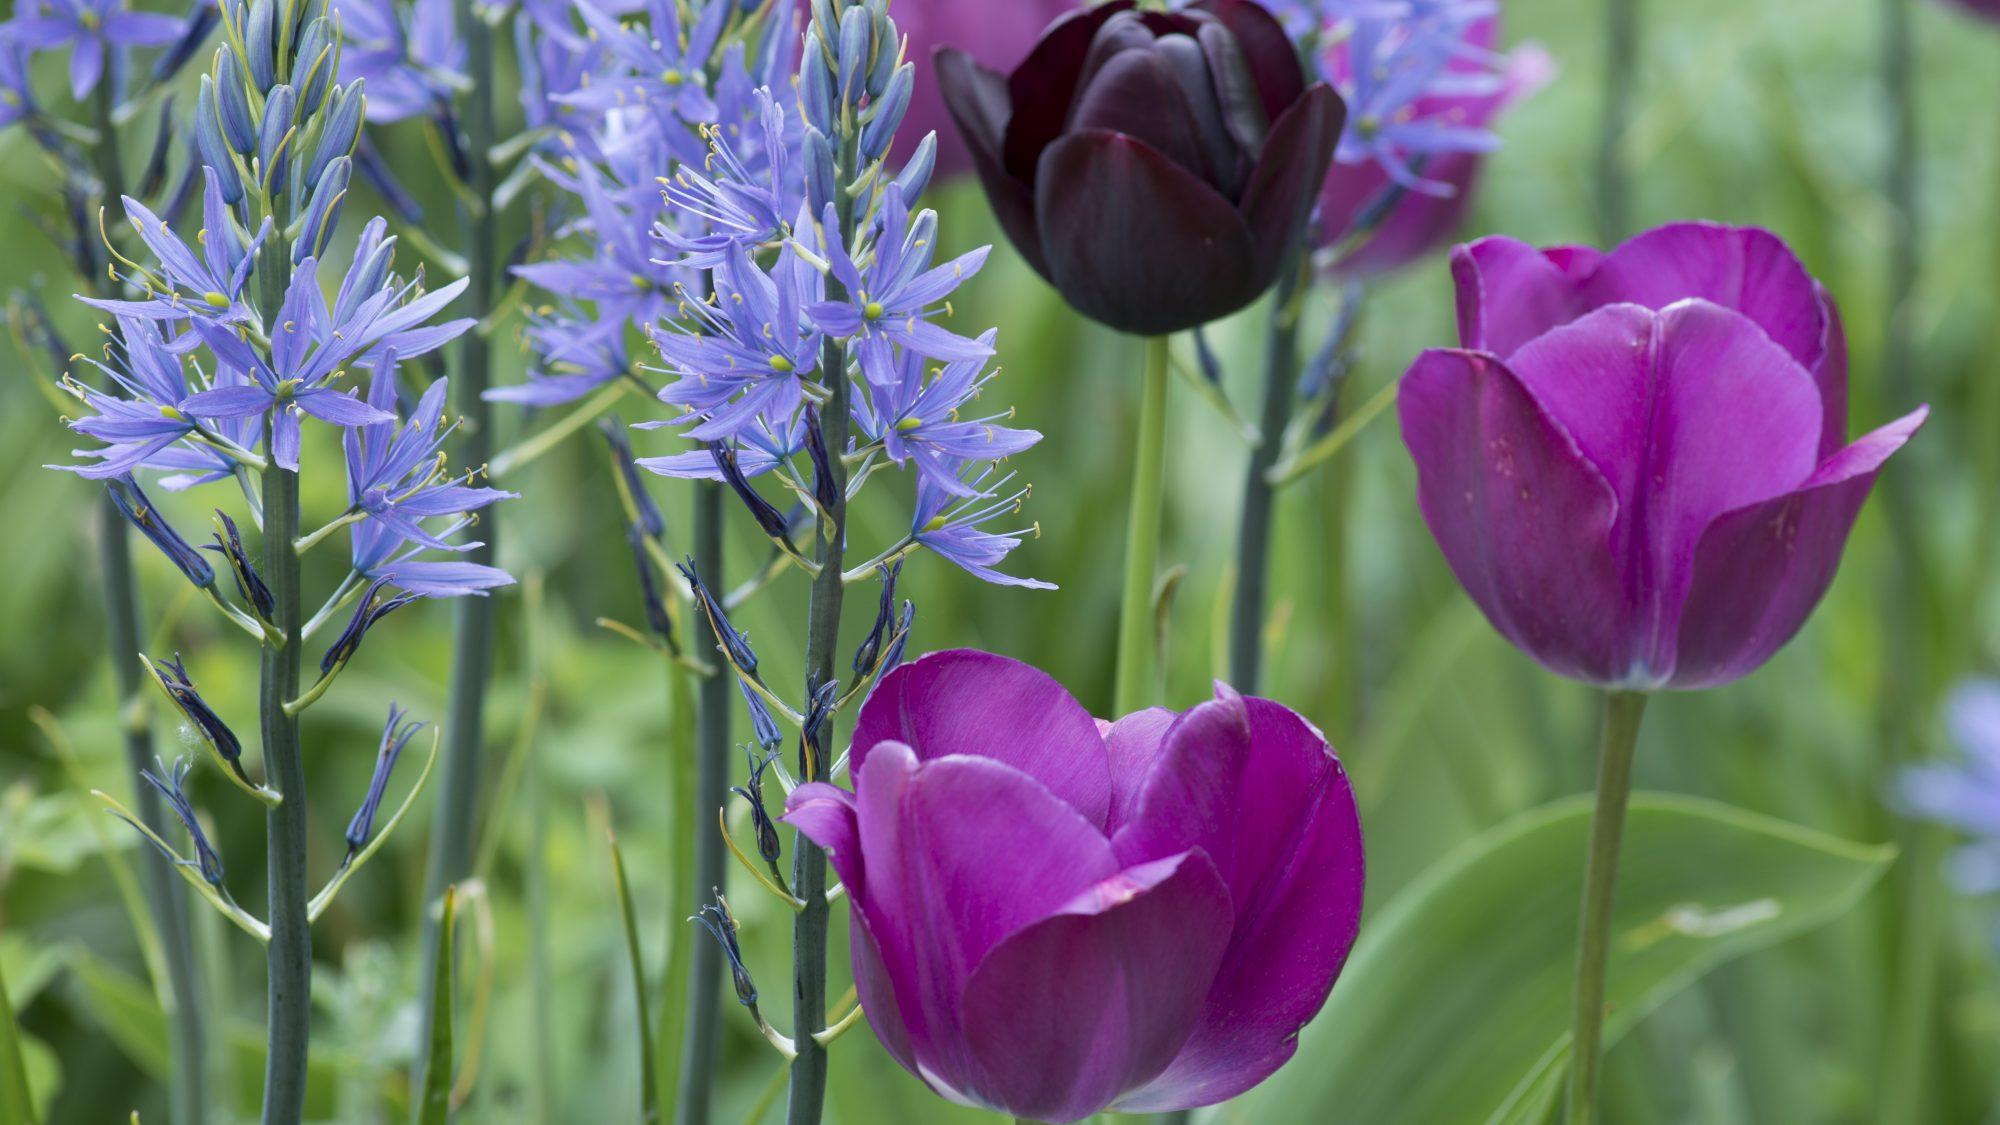 Camassia leichtlinii interplanted with tulips.